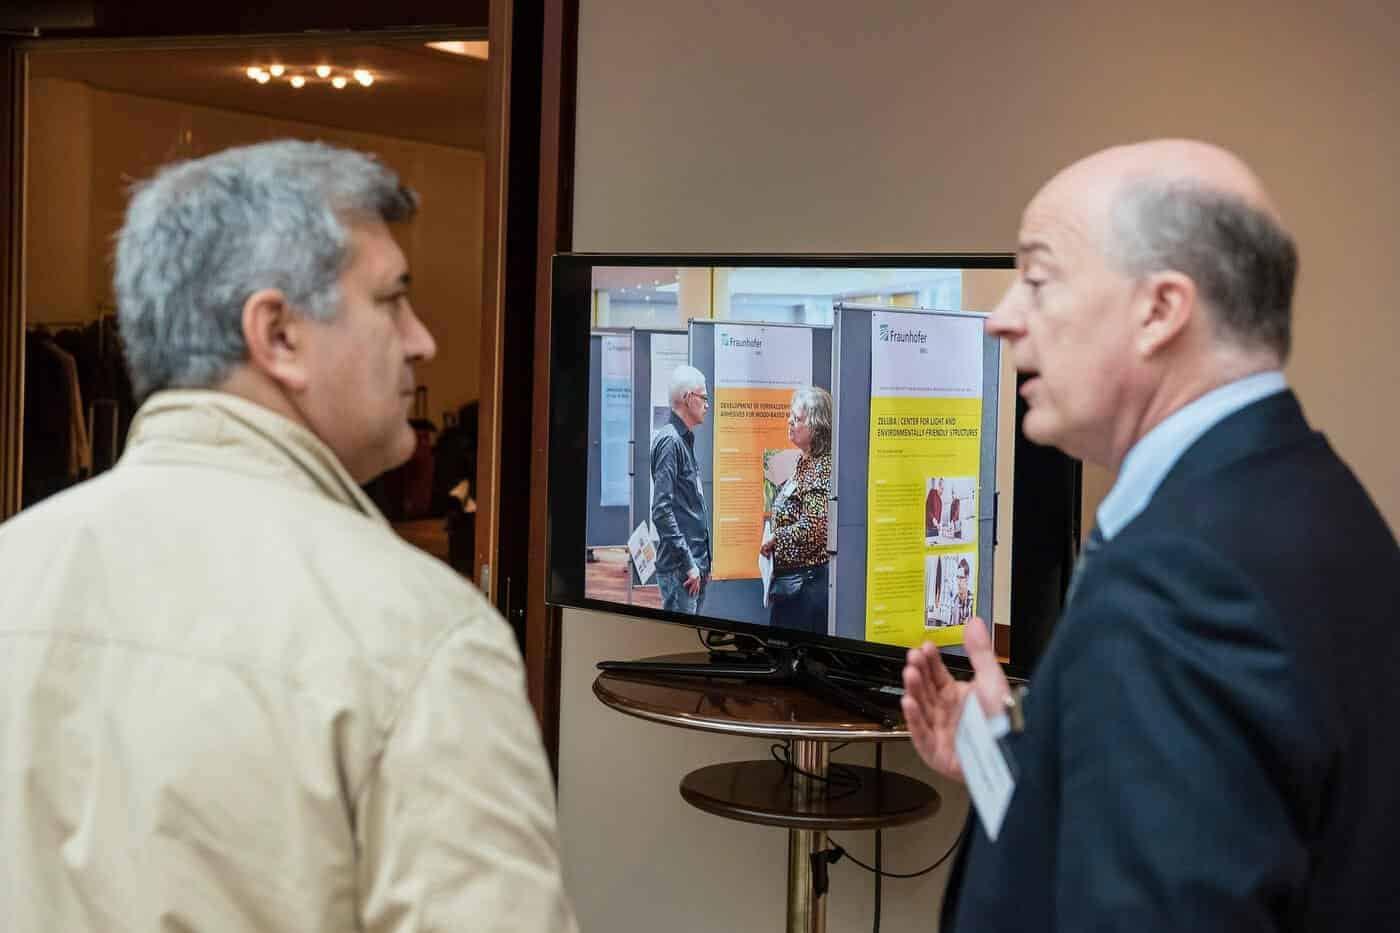 diashow fotograf hamburg kongress tagung symposium event veranstaltung